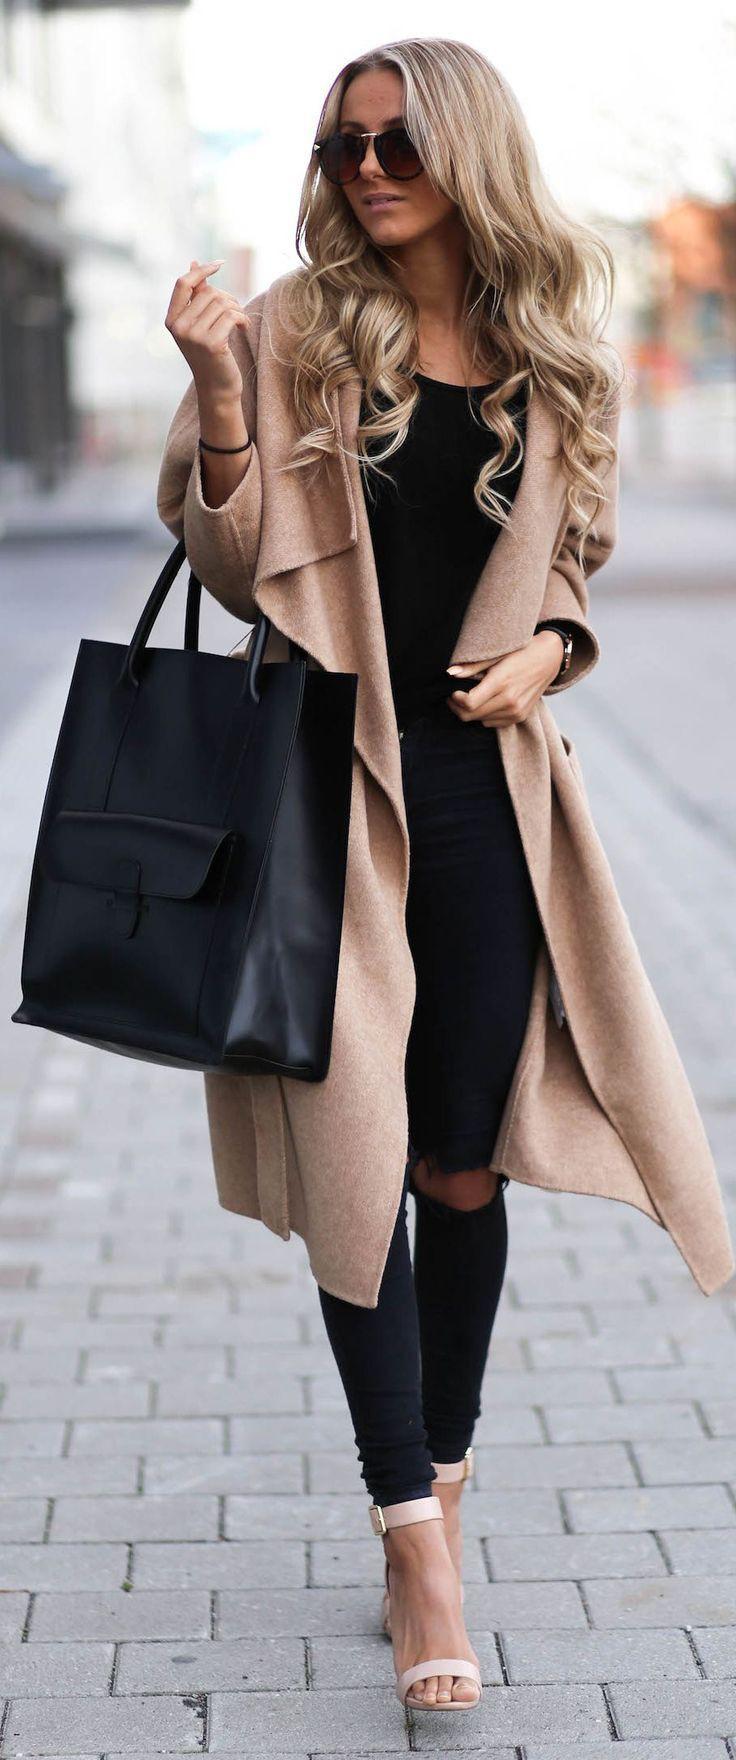 Long coat women outfit, Trench coat